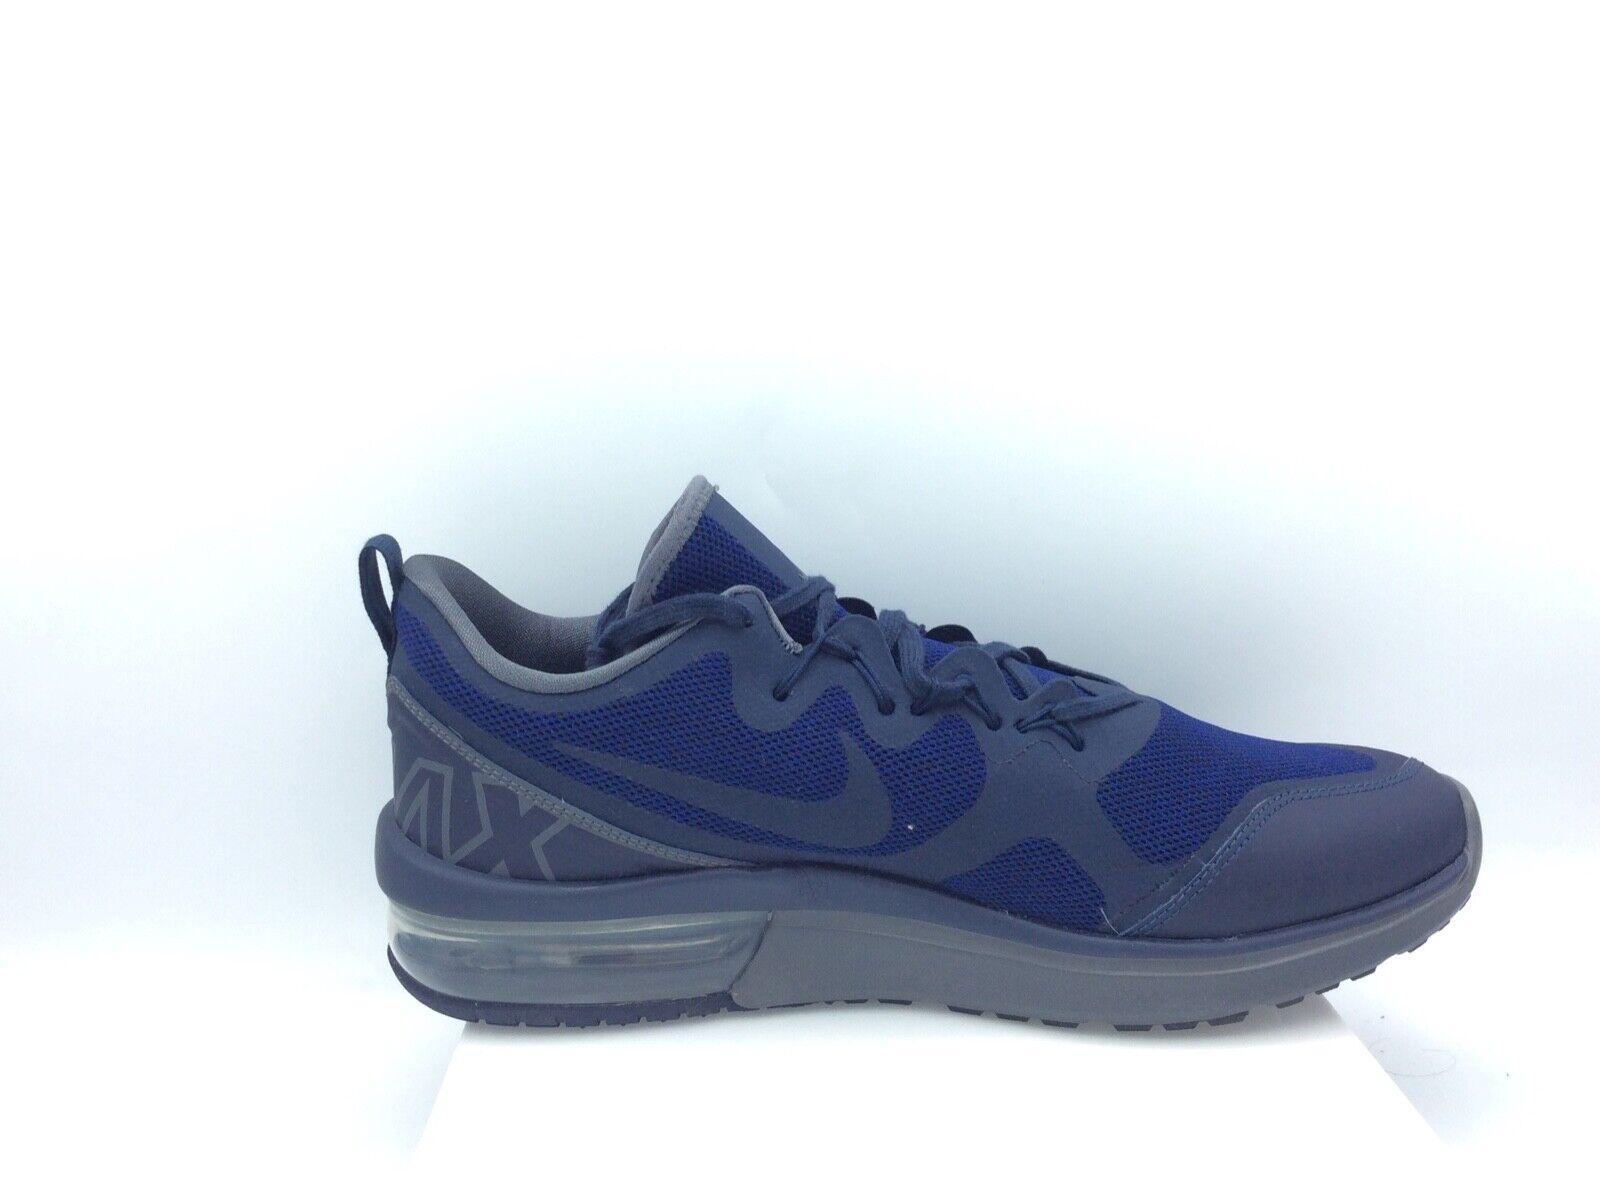 Nike, Men's Air Max Fury Running shoes, Obsidian Dark Grey, Size 11